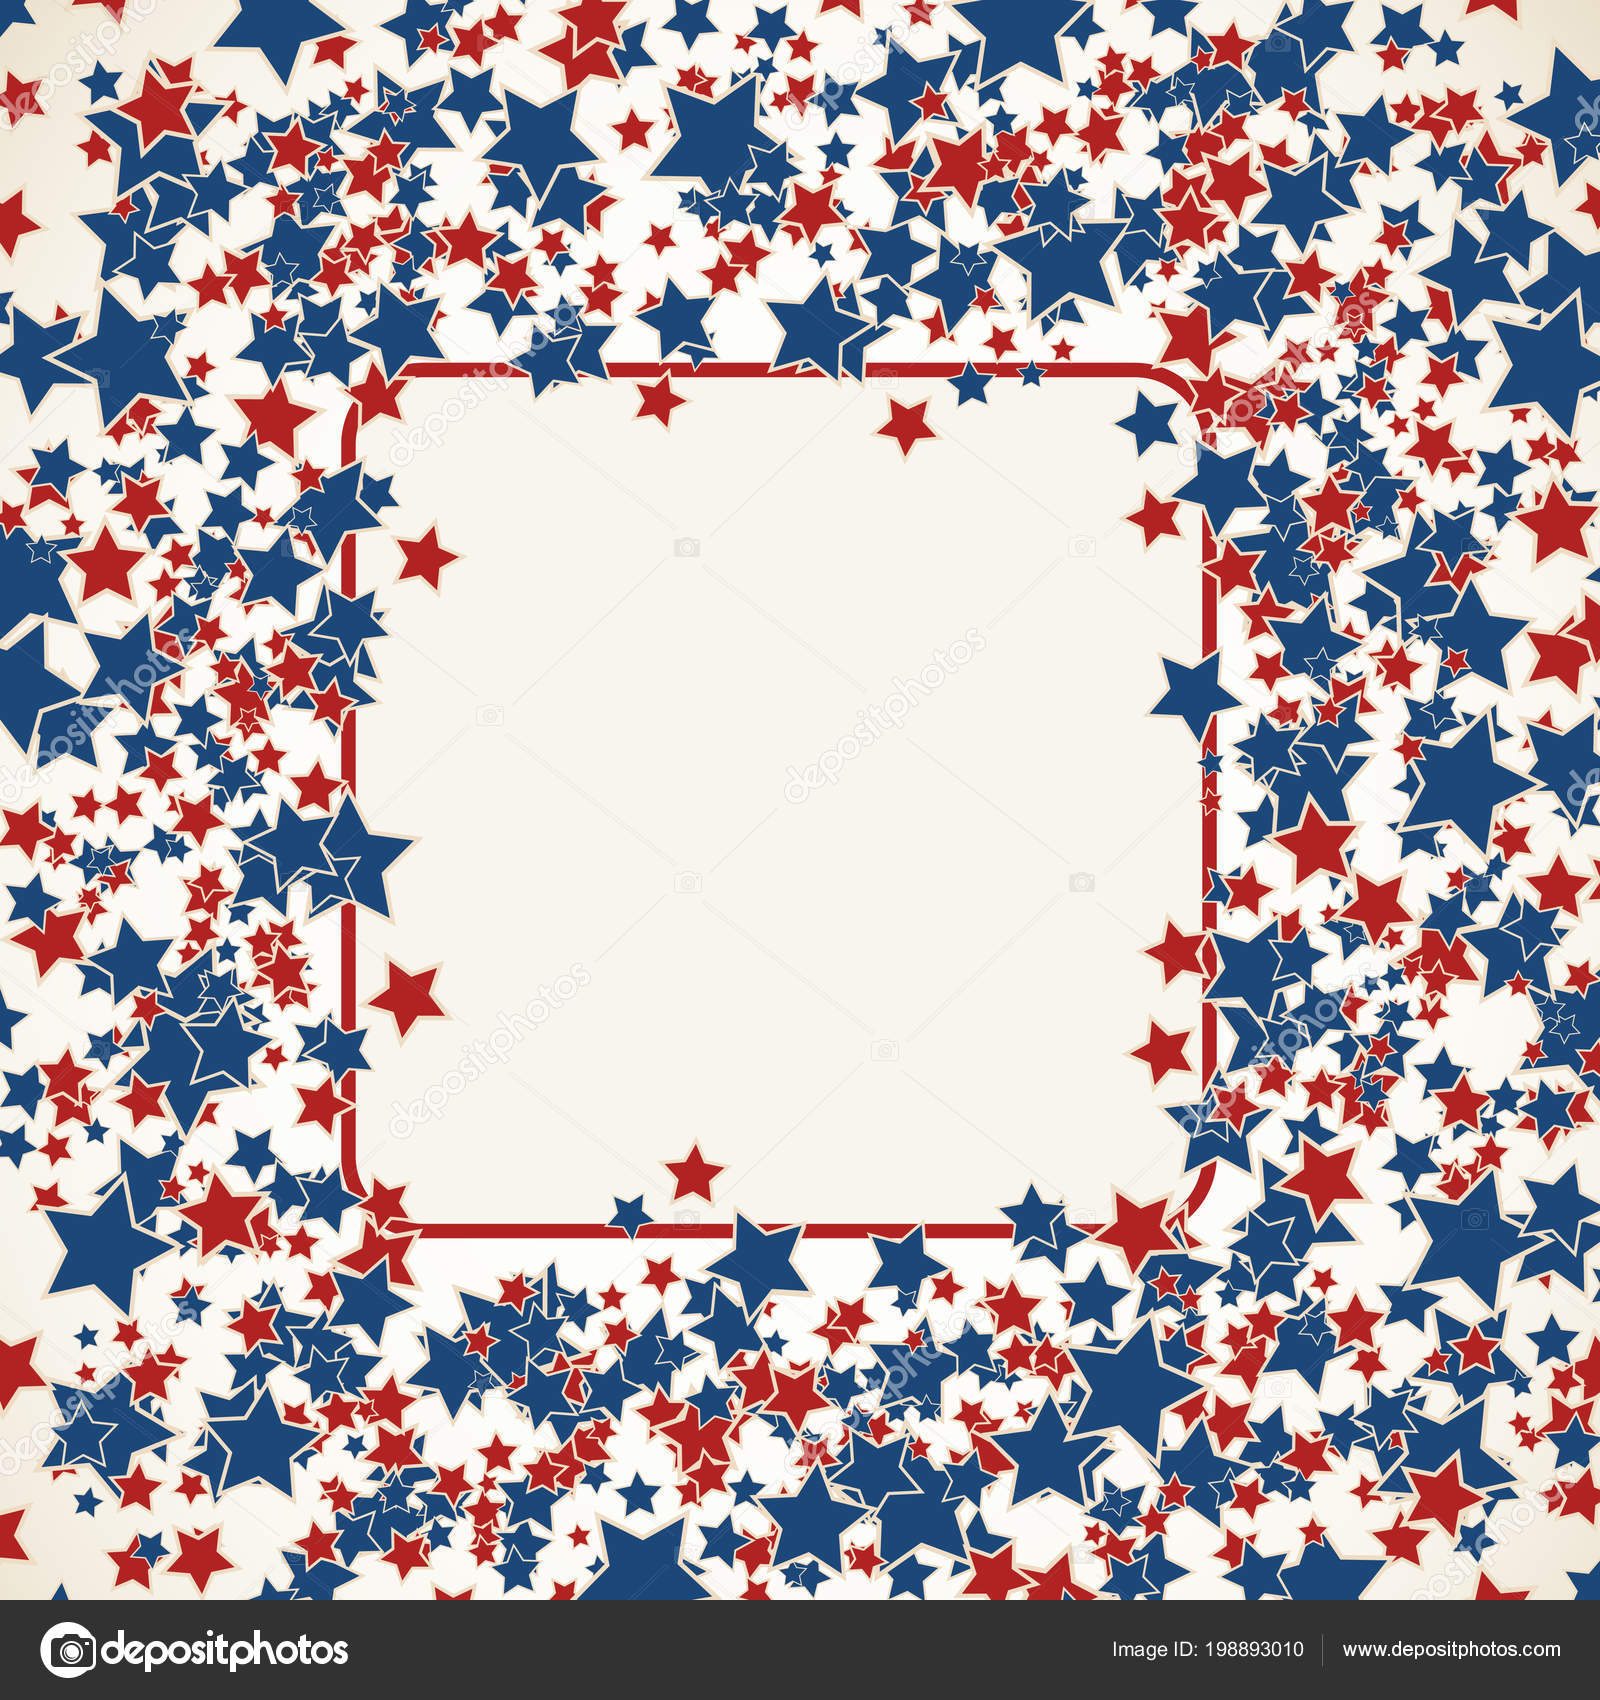 Amerikanische Patriotische Hintergrund Vereinigten Staaten Leeren ...